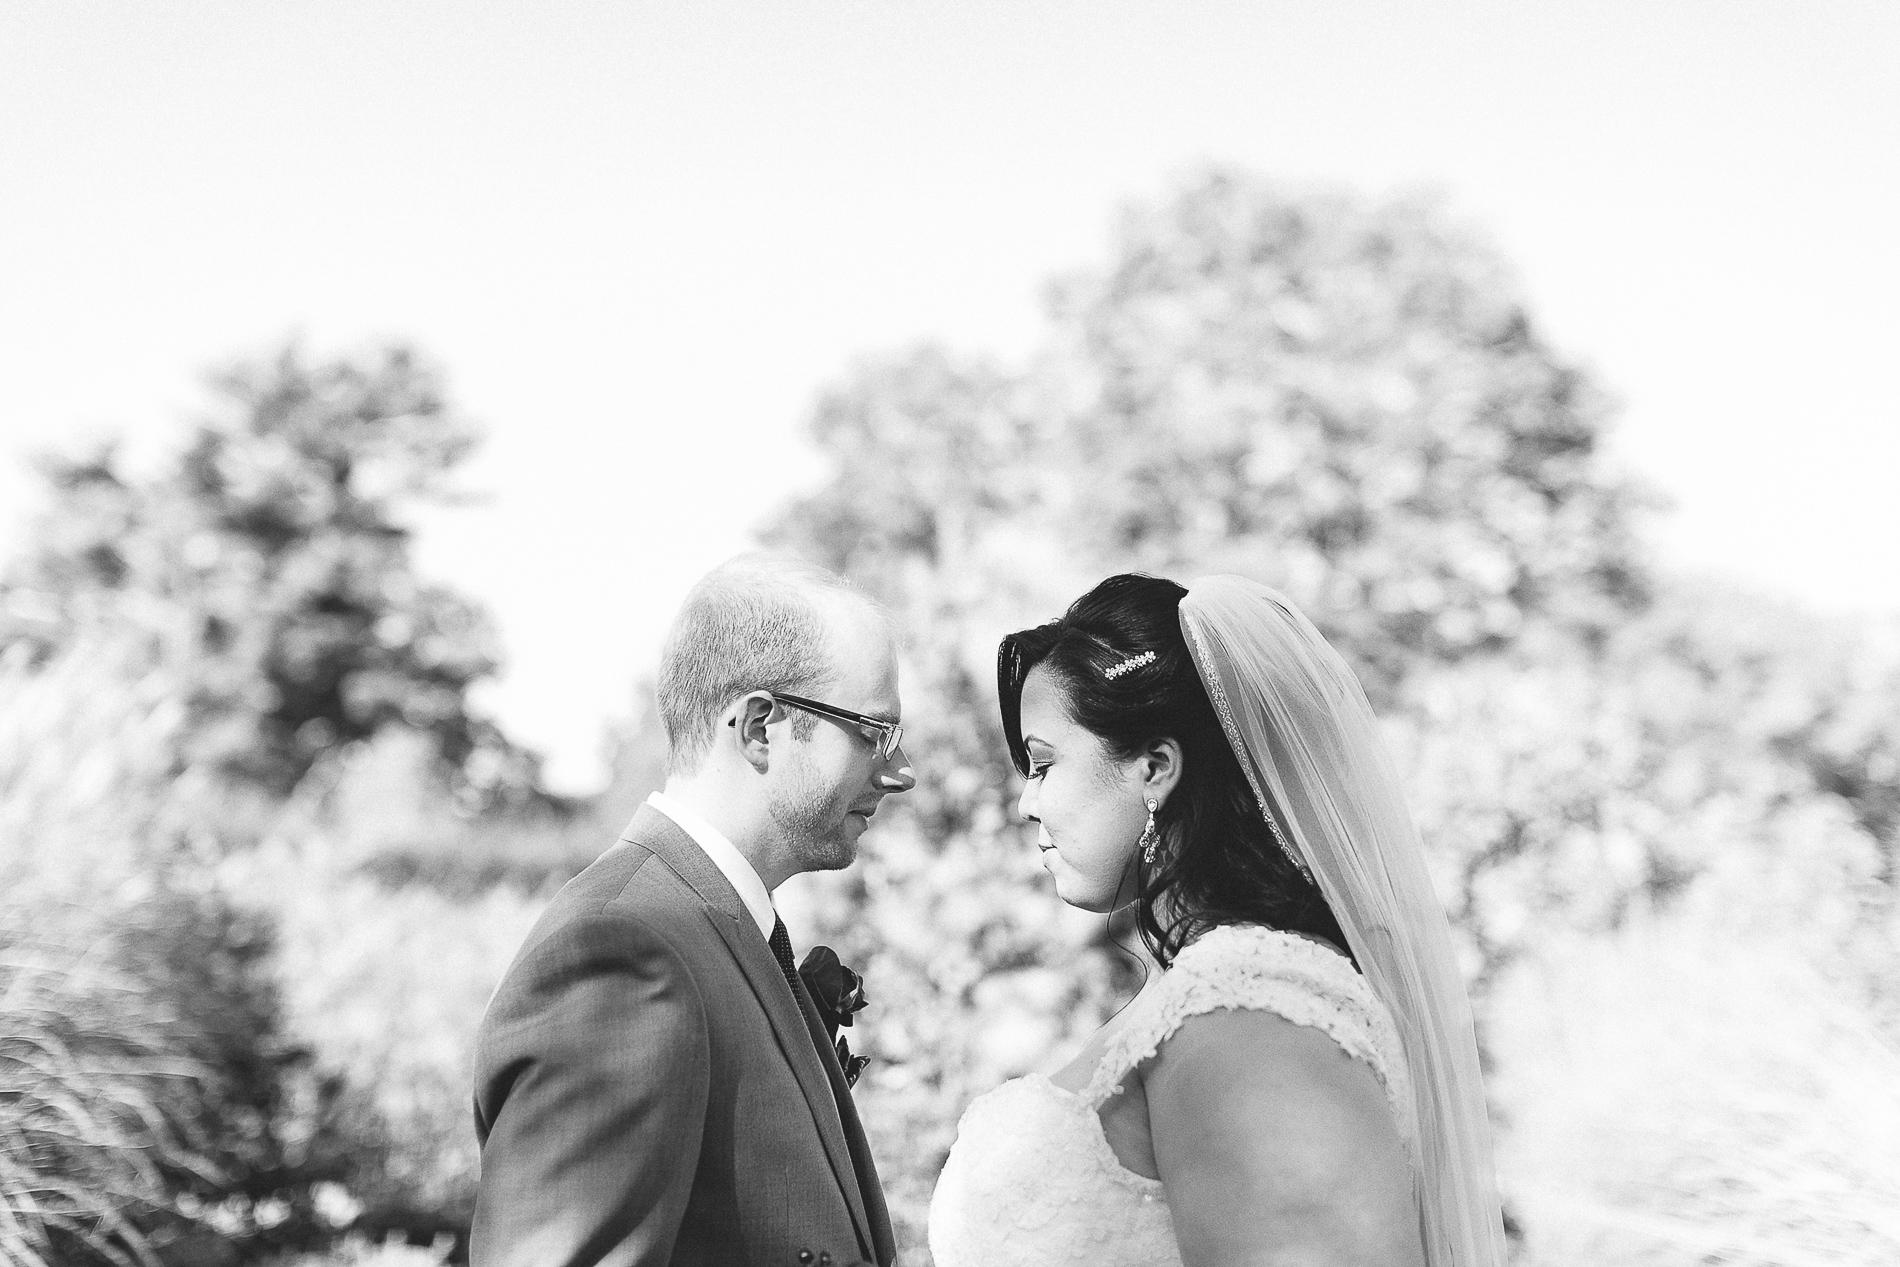 boston wedding photographer 4 Â boston wedding photographer new